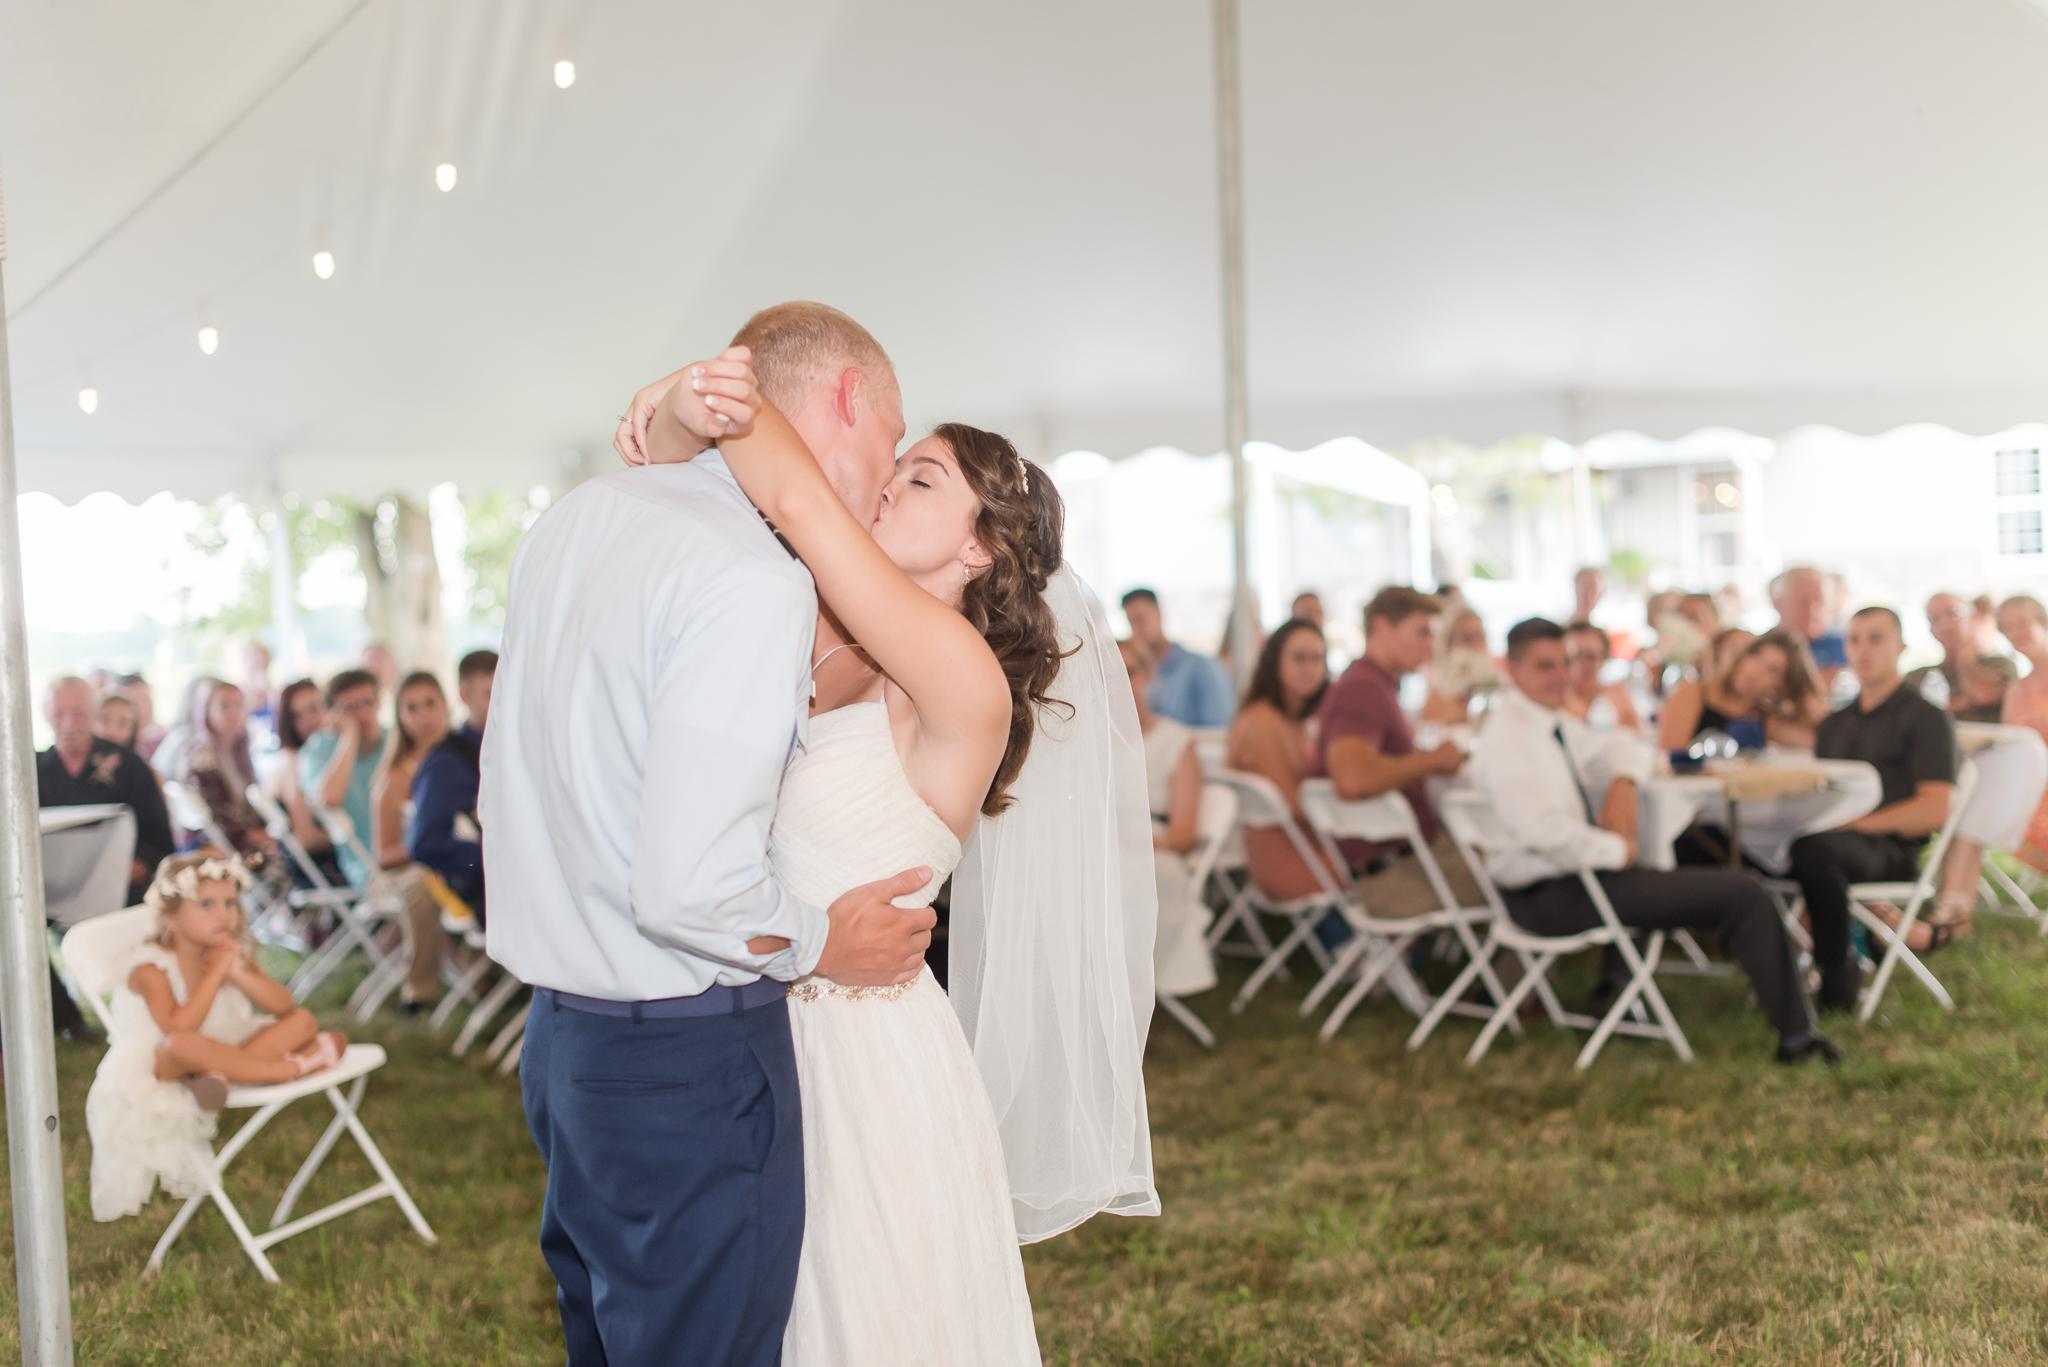 Anderson, Indiana Wedding Photographers5202.jpg